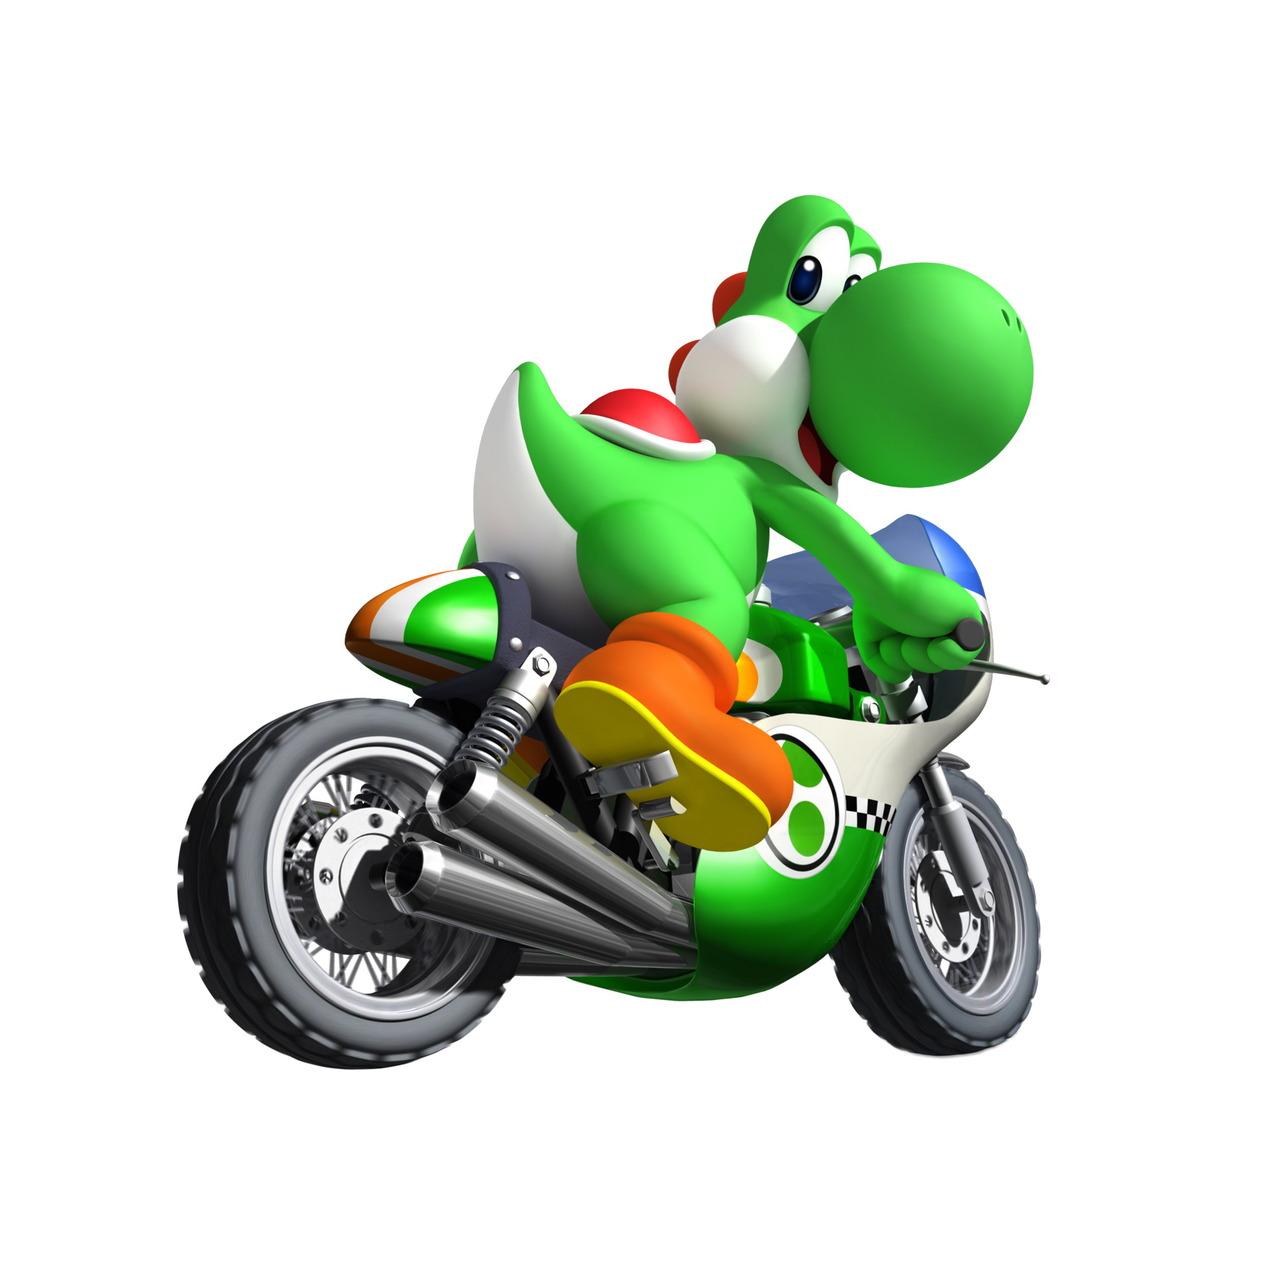 jeuxvideo.com Mario Kart Wii - Wii Image 362 sur 362